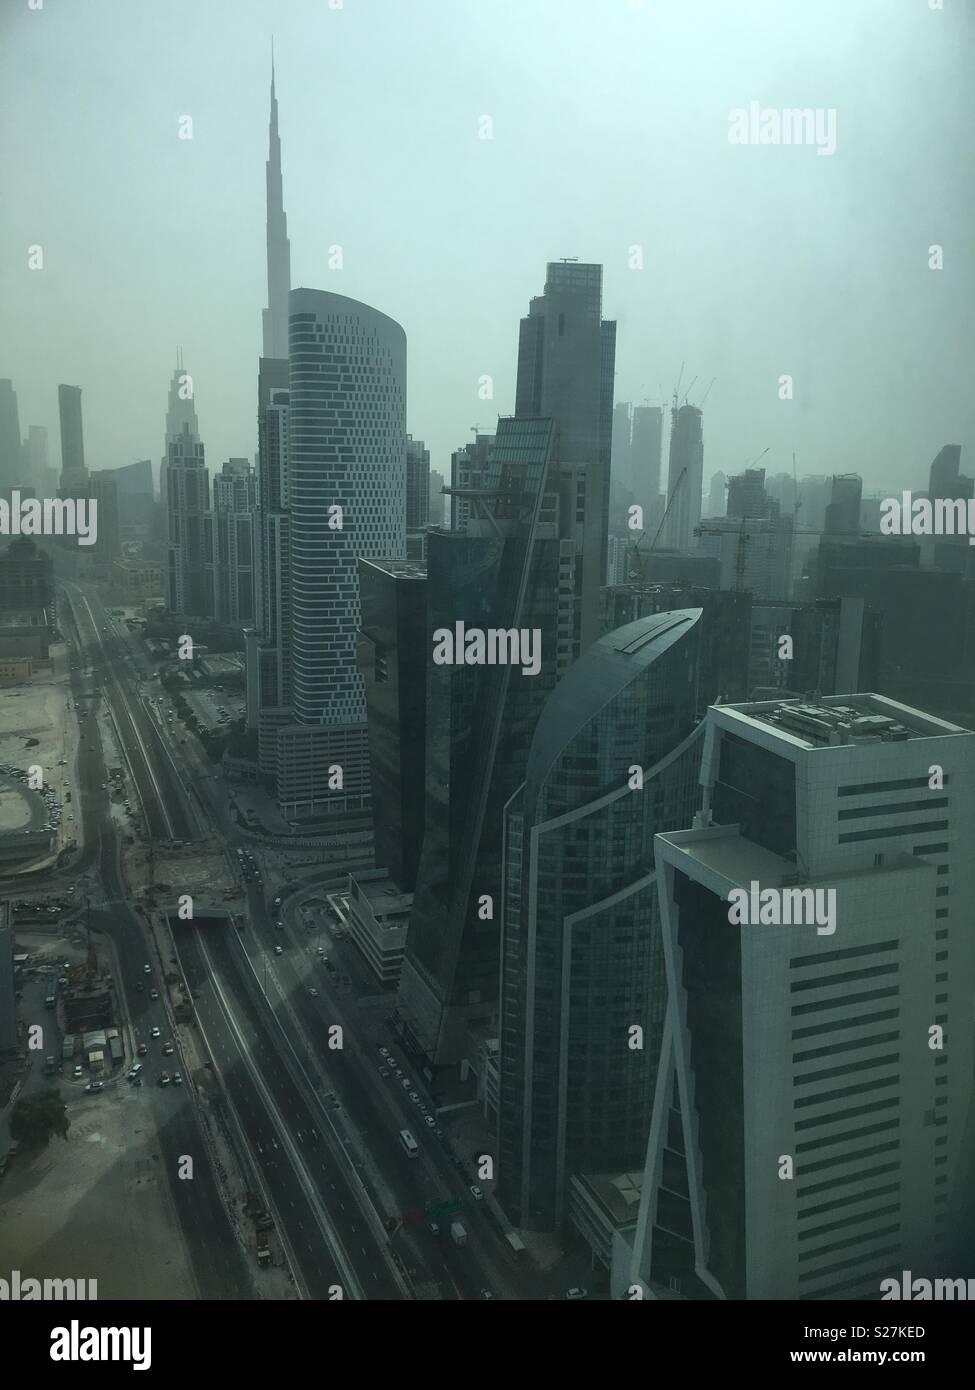 Sky scrapers in Dubai on a hazy day. Burj Khalifa in the background. - Stock Image